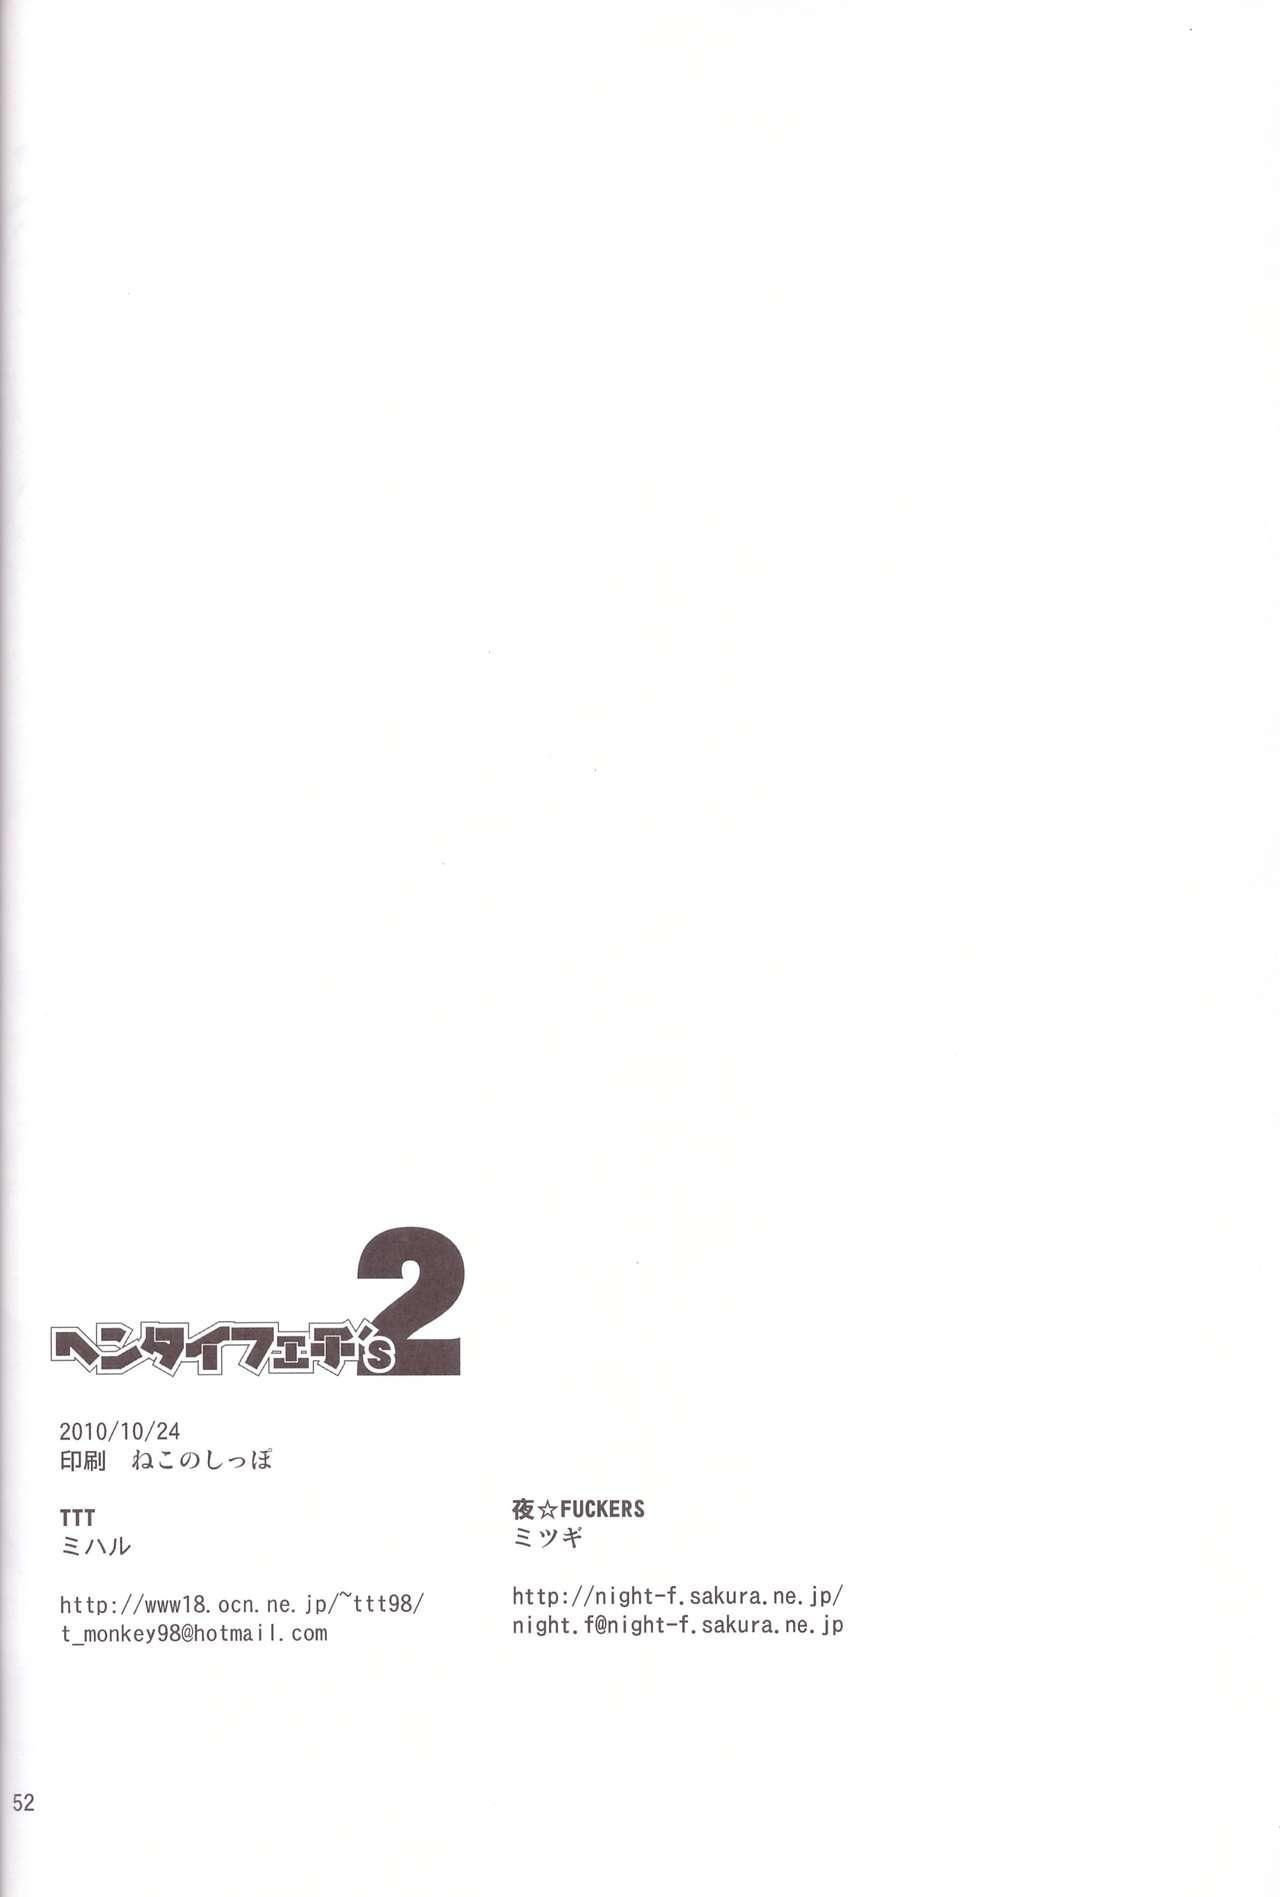 Hentai Fetish's 2 51